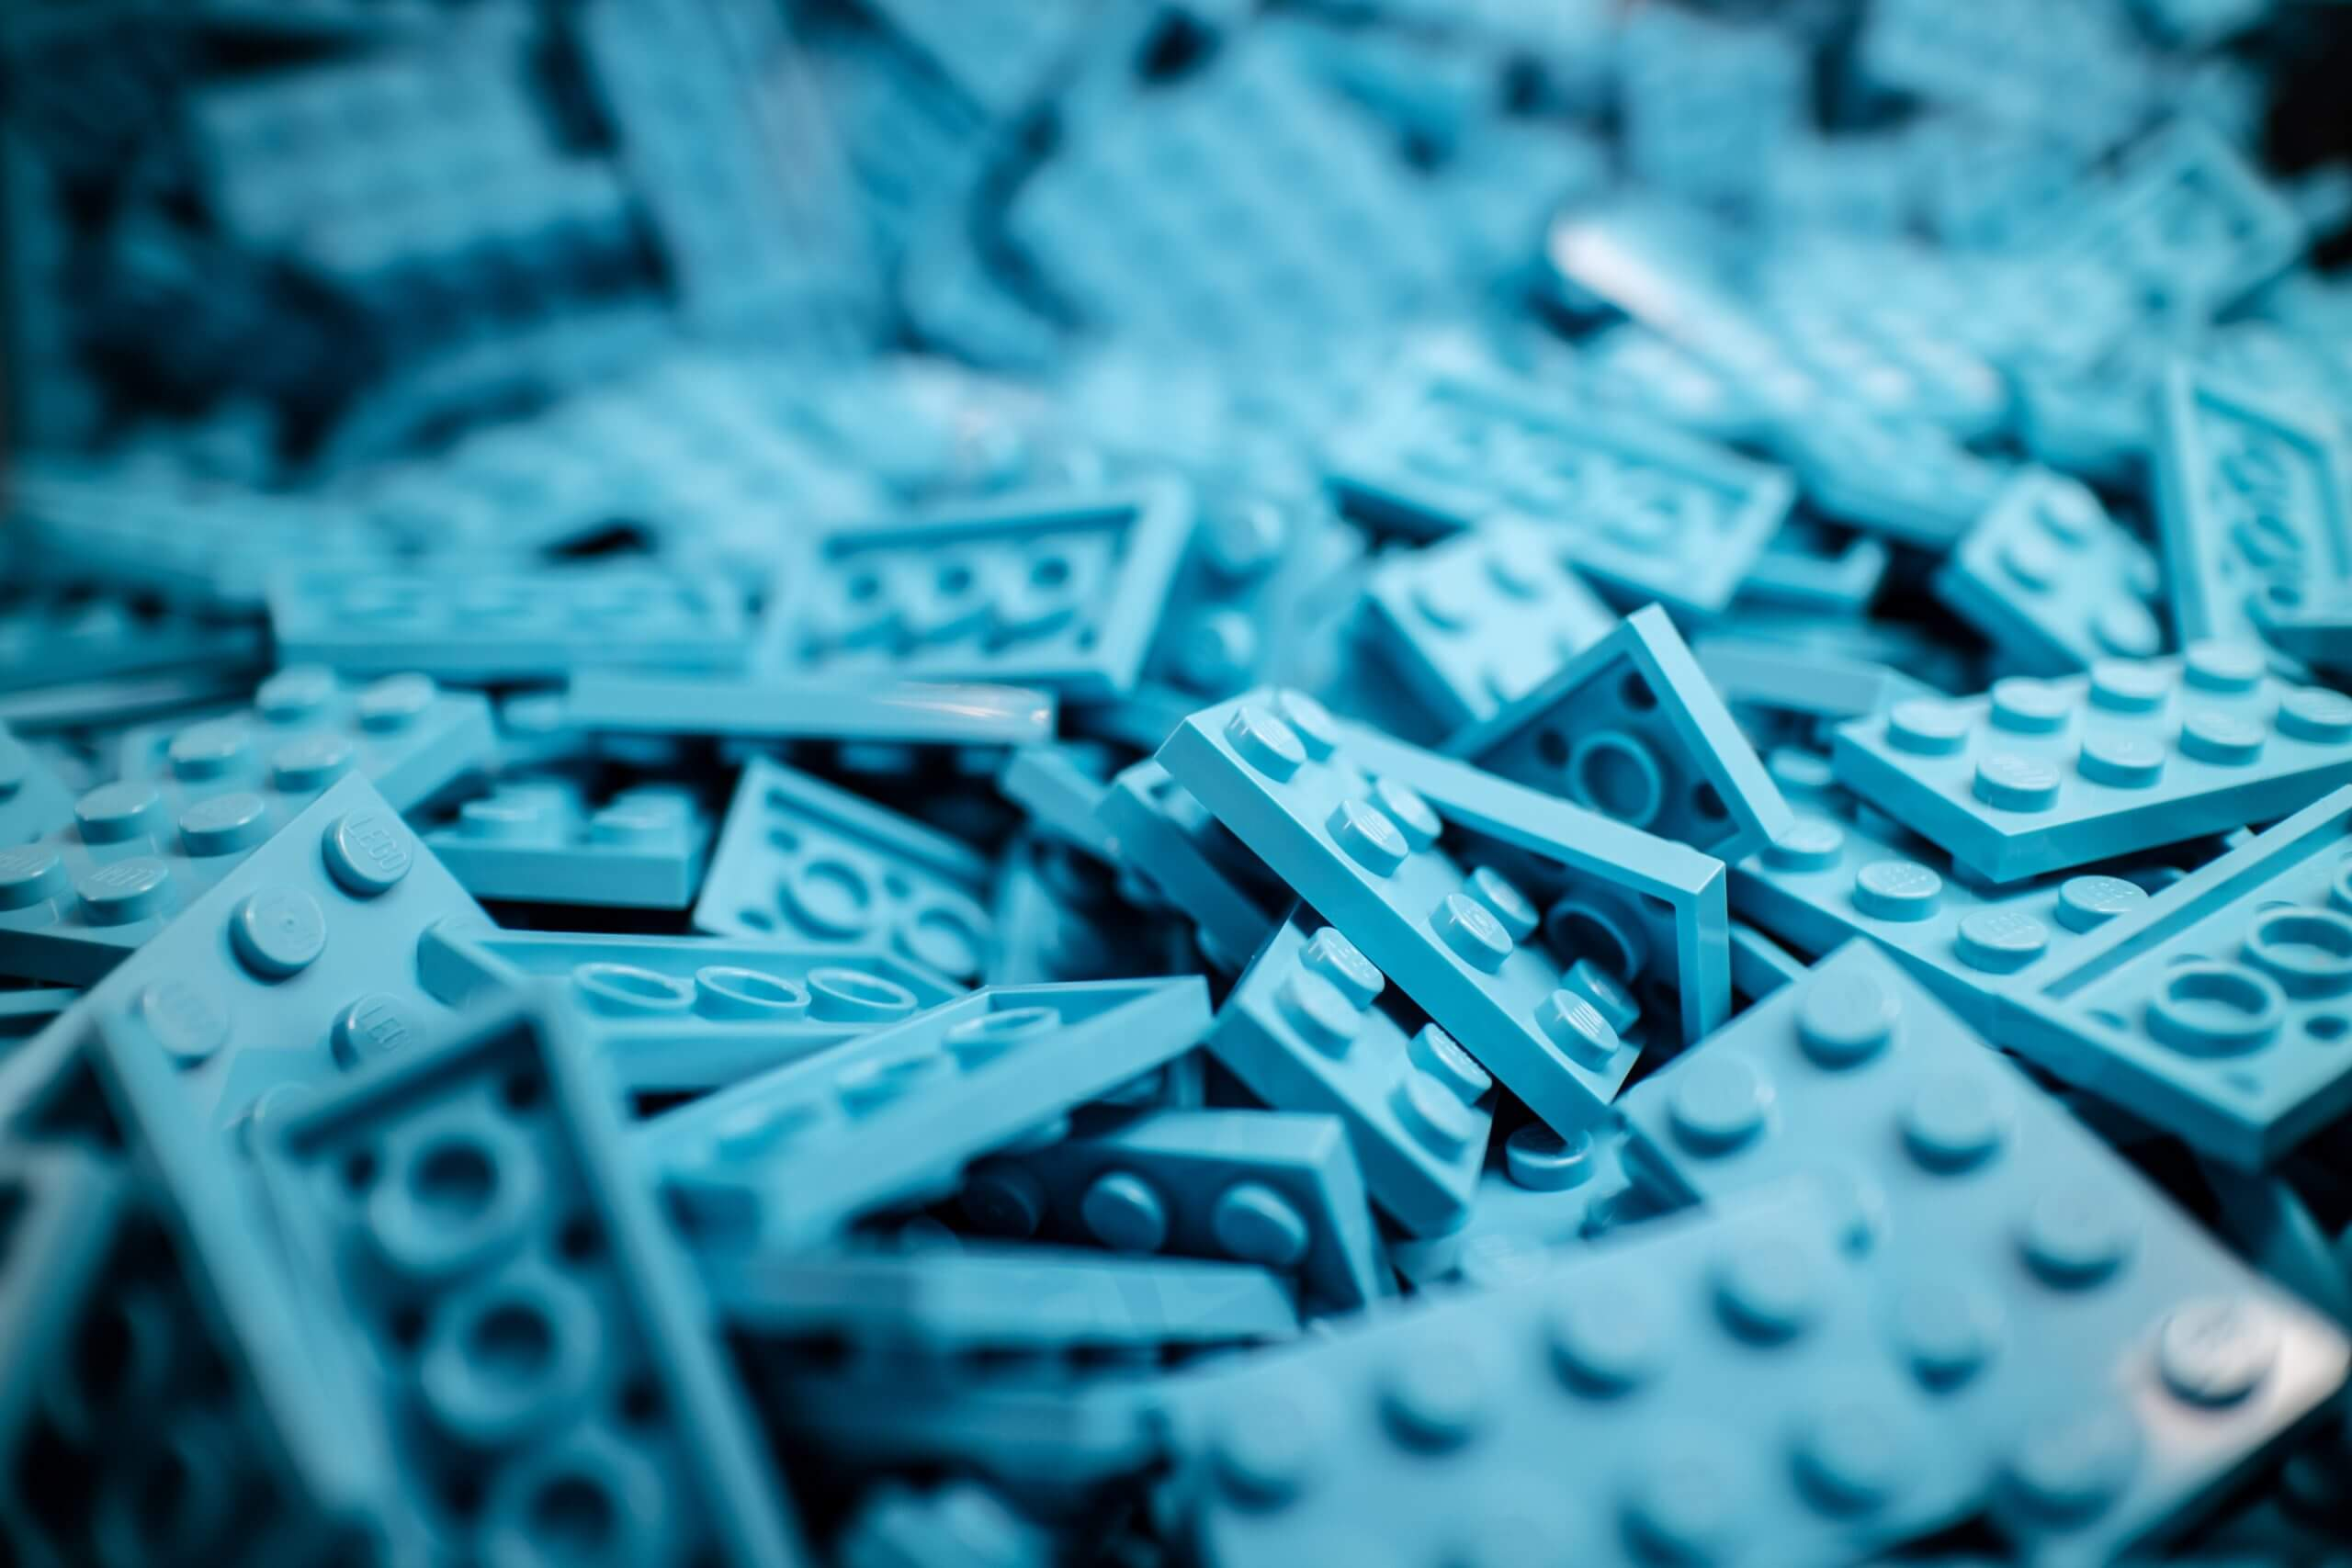 Blue lego brick in a pile